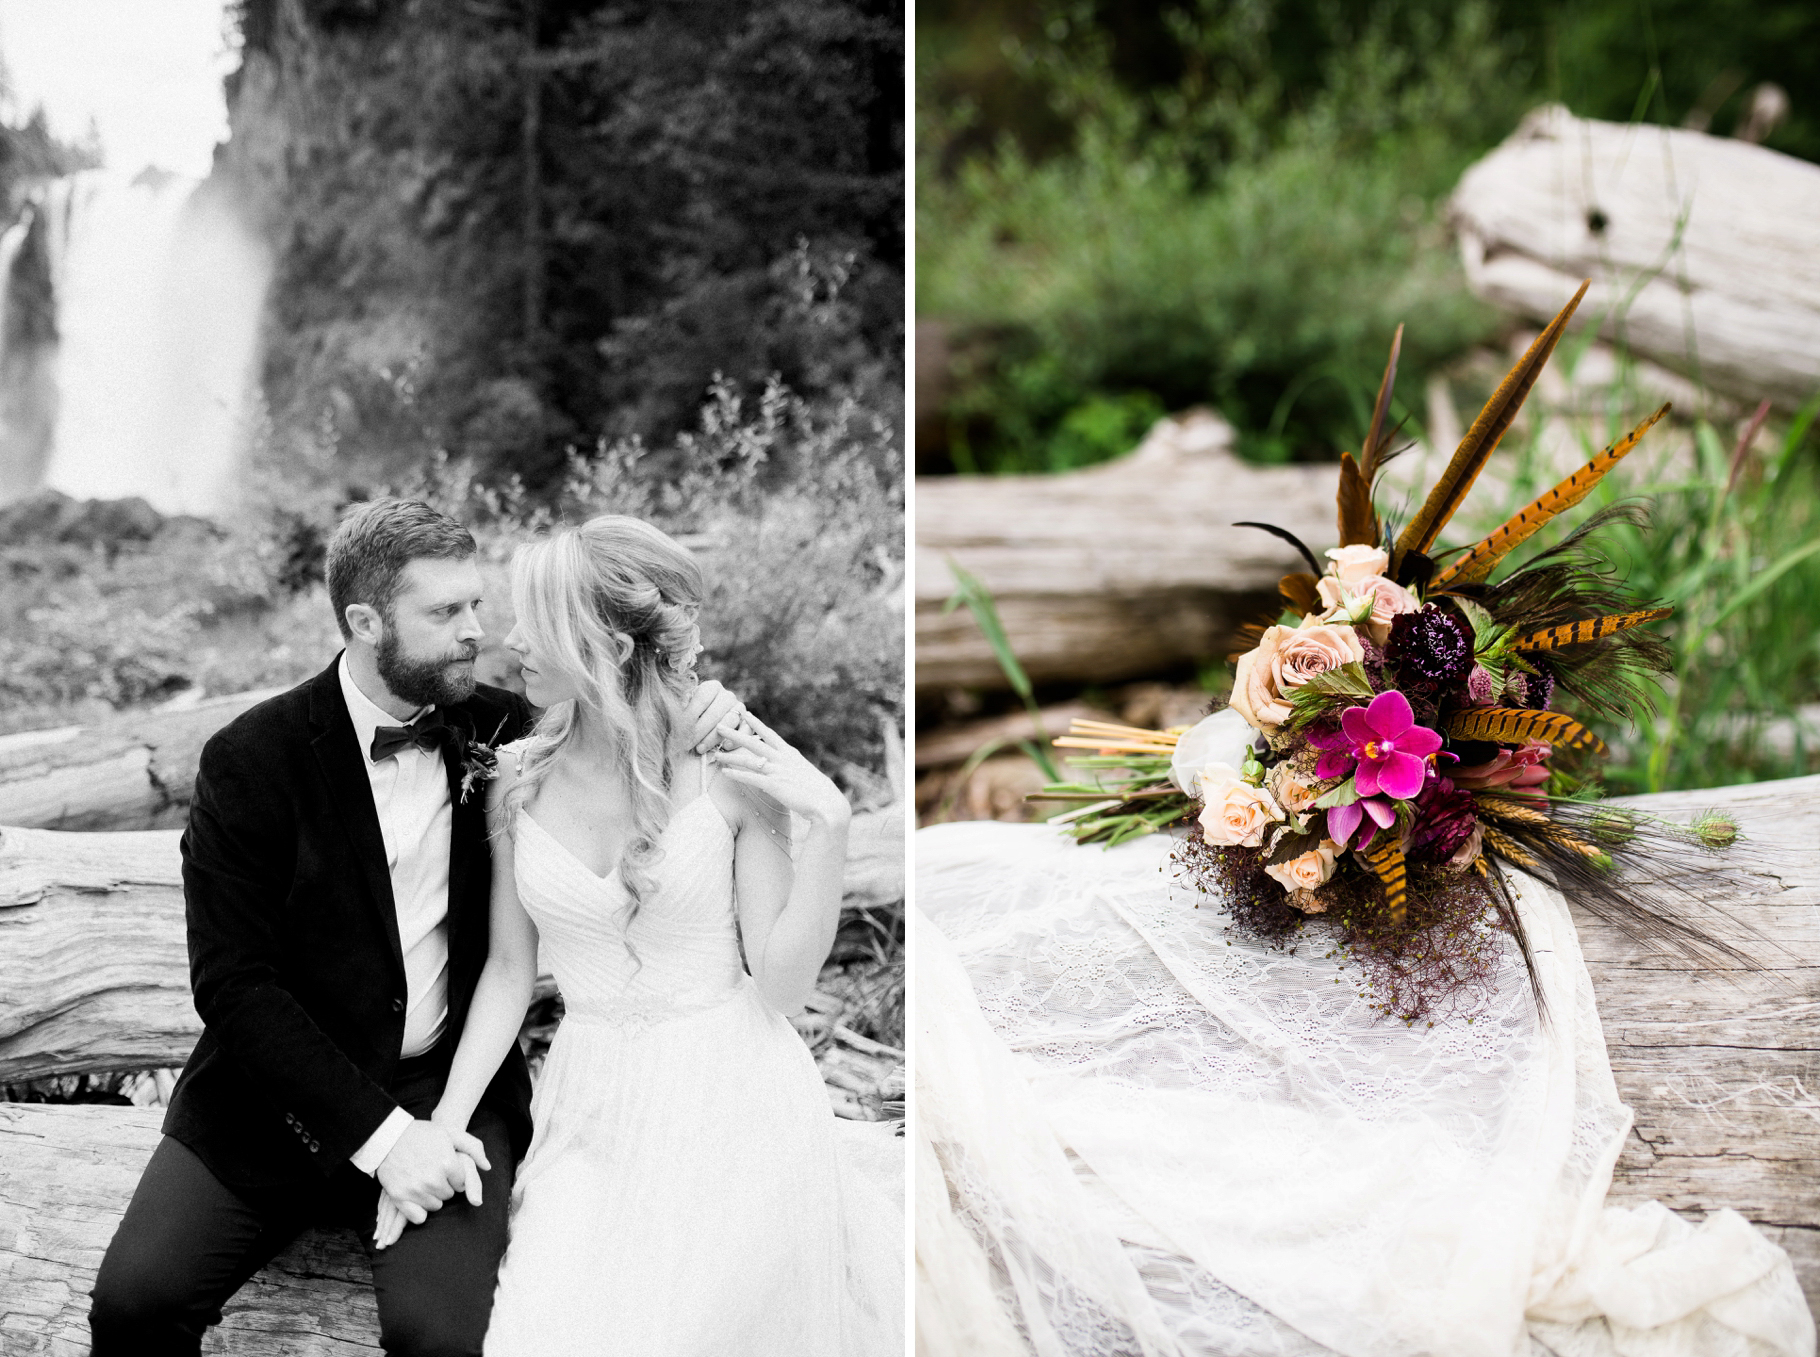 18-Adventure-Elopement-Waterfall-Seattle-Wedding-Photographer-Snoqualmie-Falls-Hike